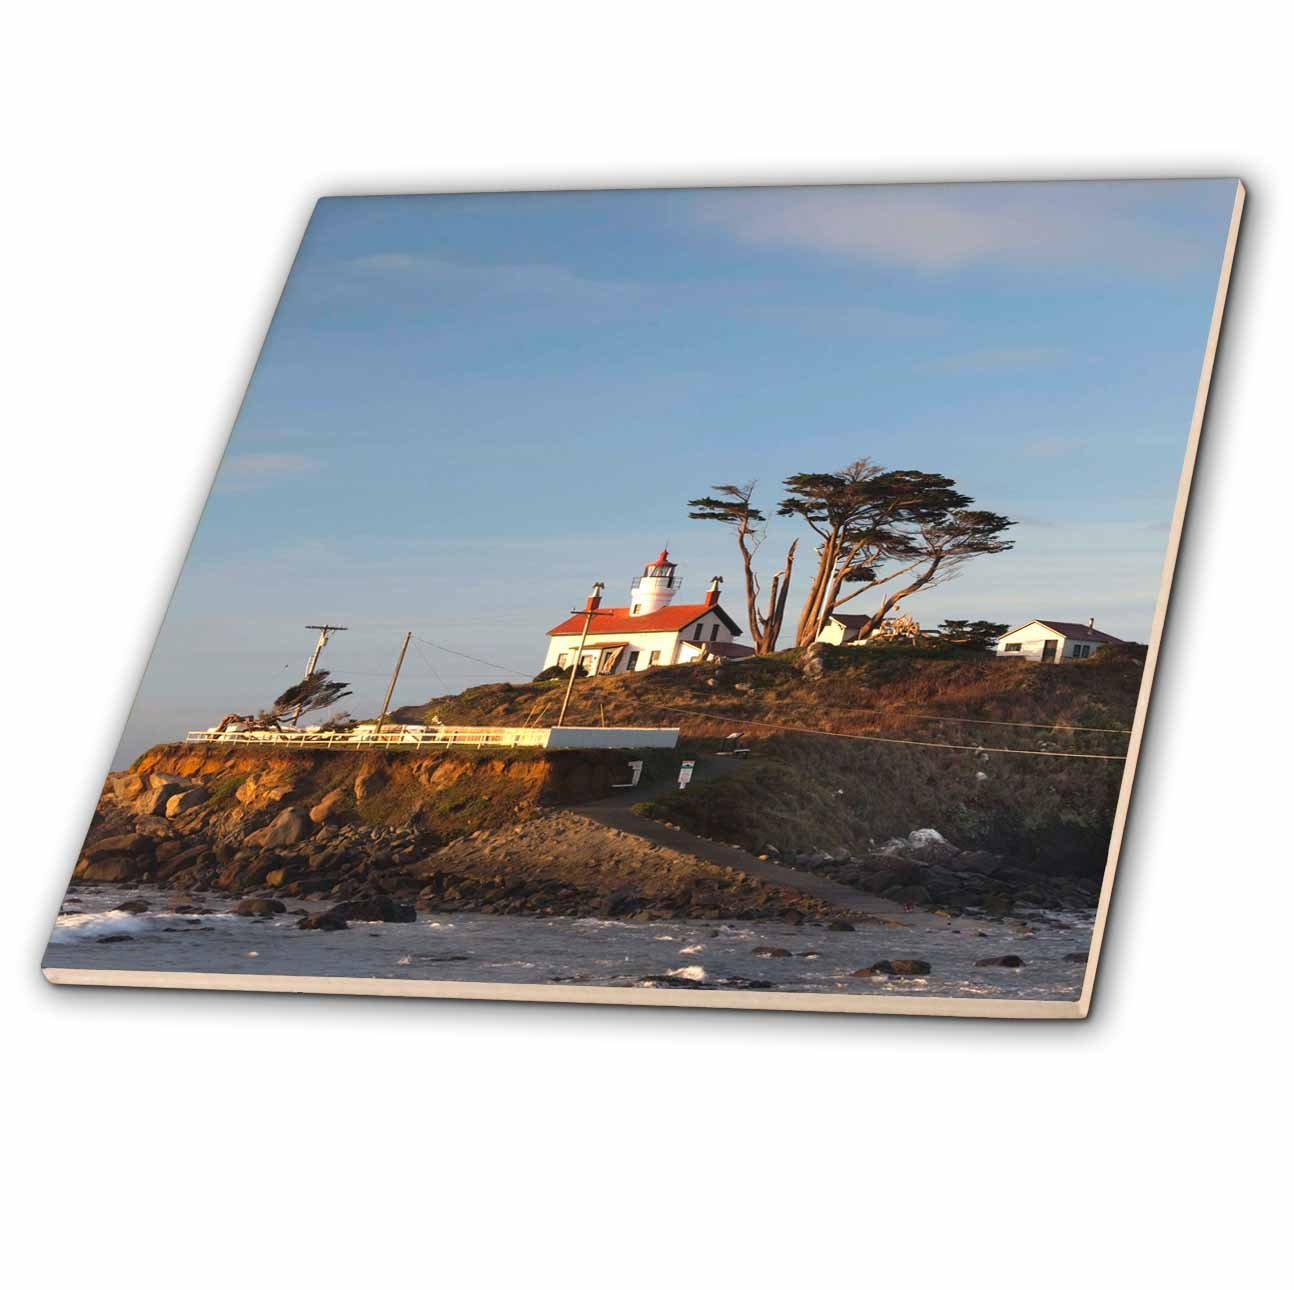 Crescent City US05 WBI1553 Battery Point Lighthouse Lighthouses ct/_88740/_3 8 Inch Ceramic Tile CA Walter Bibikow 3dRose Danita Delimont